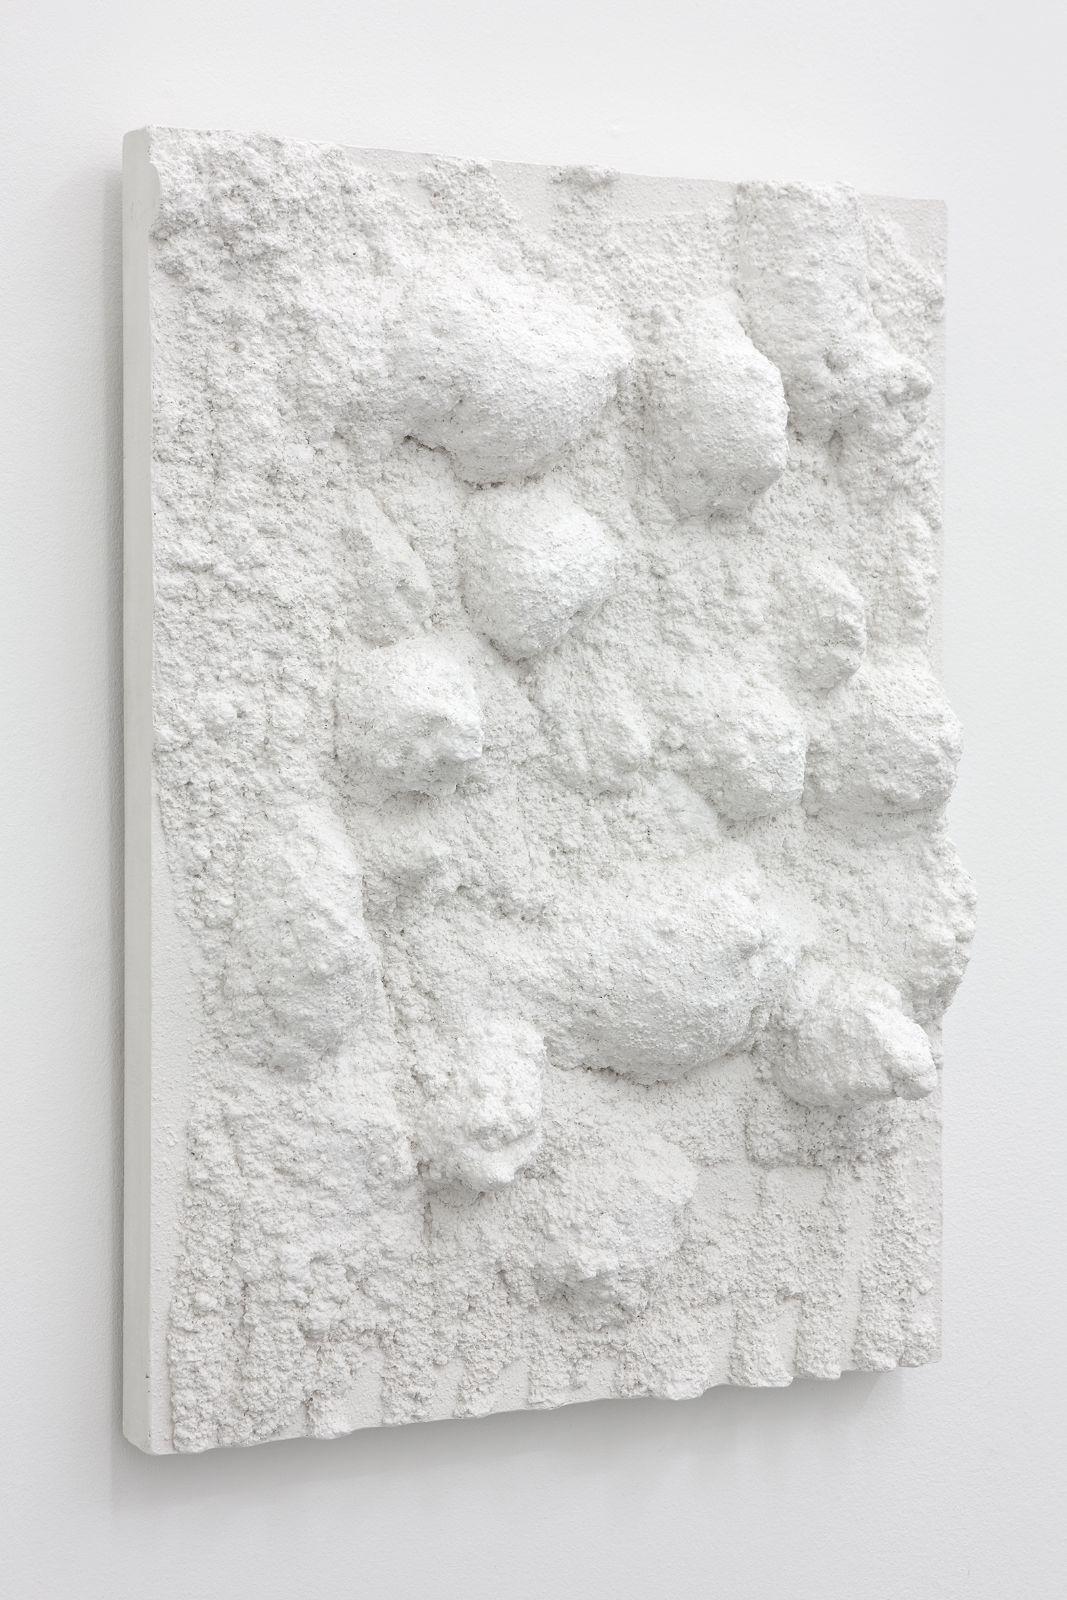 Untitled, 2012, plaster, 60 x 45 x 12,5 cm